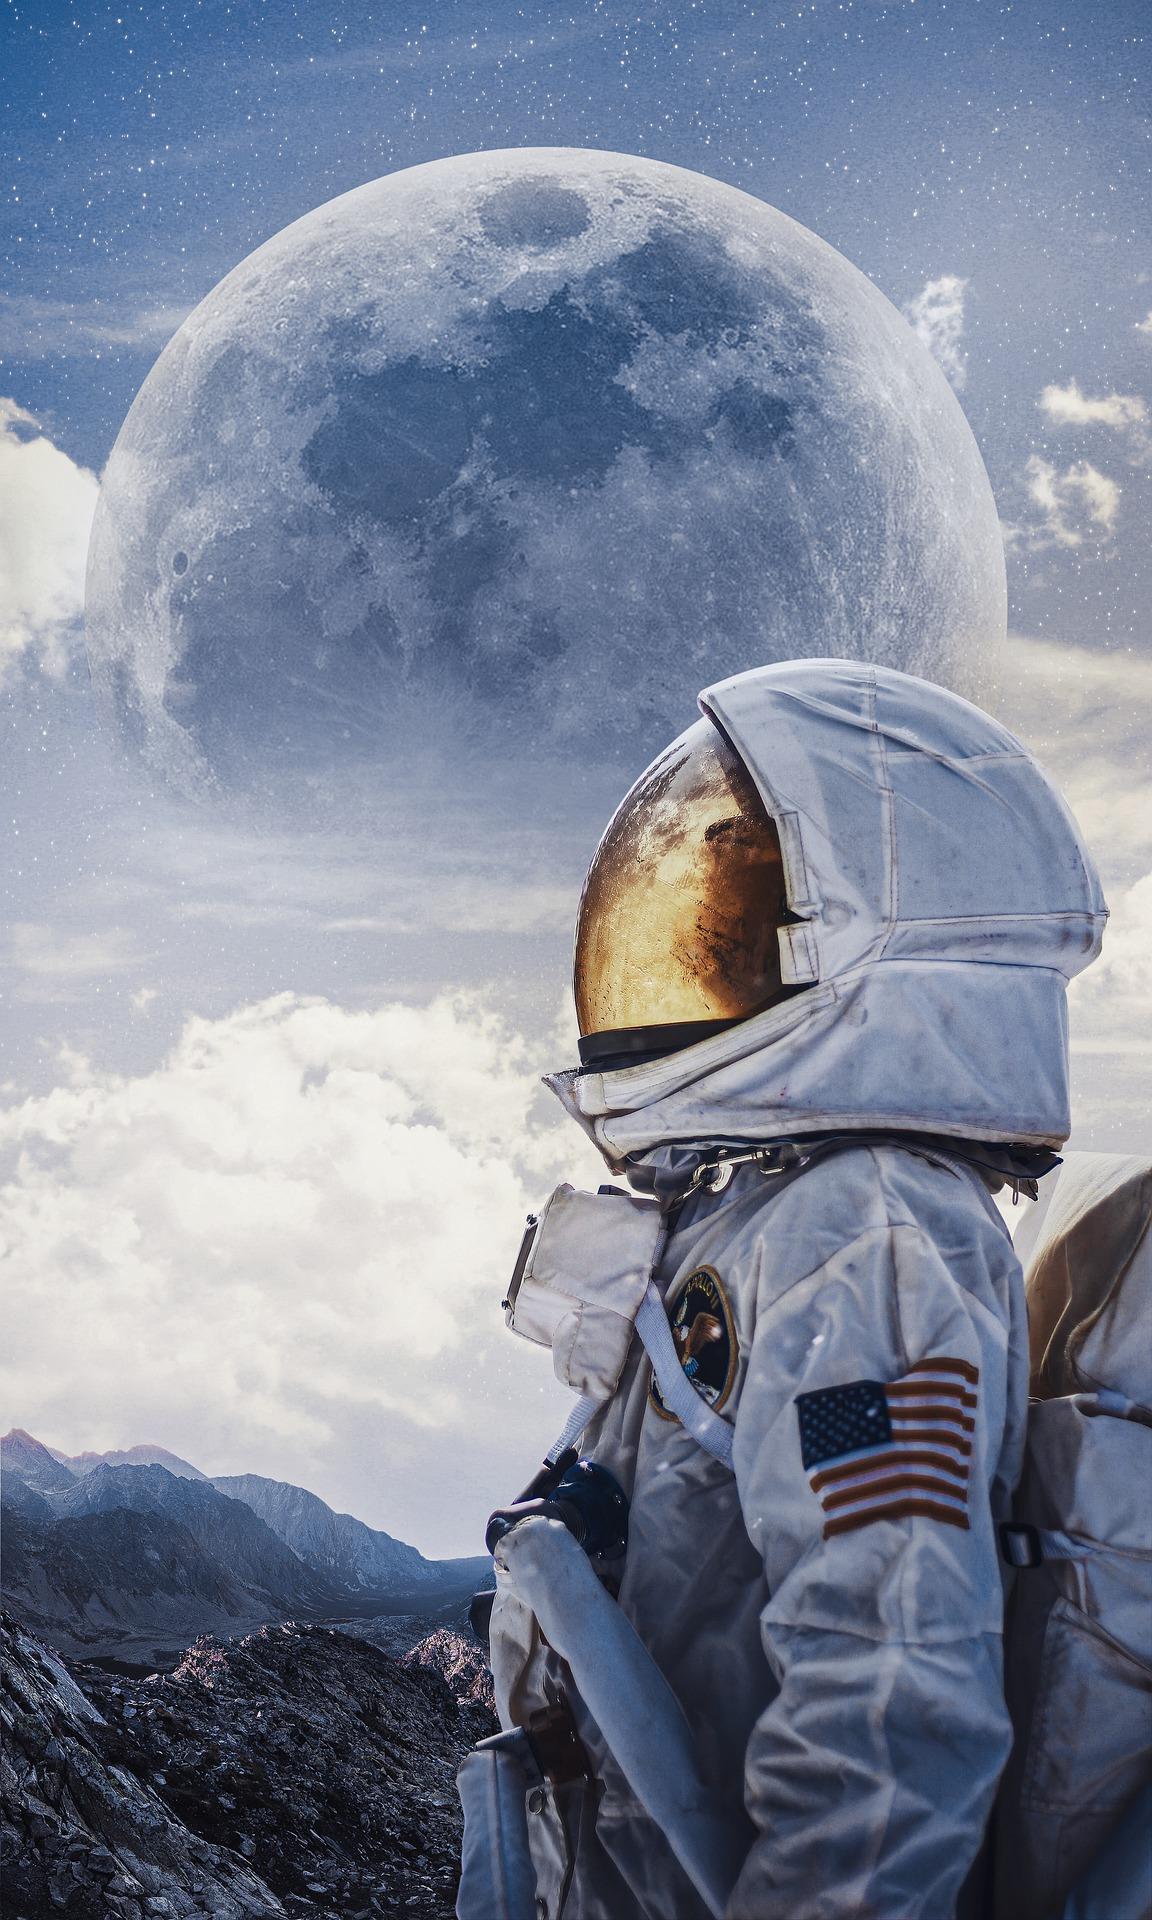 astronaut-5546460_1920.jpg